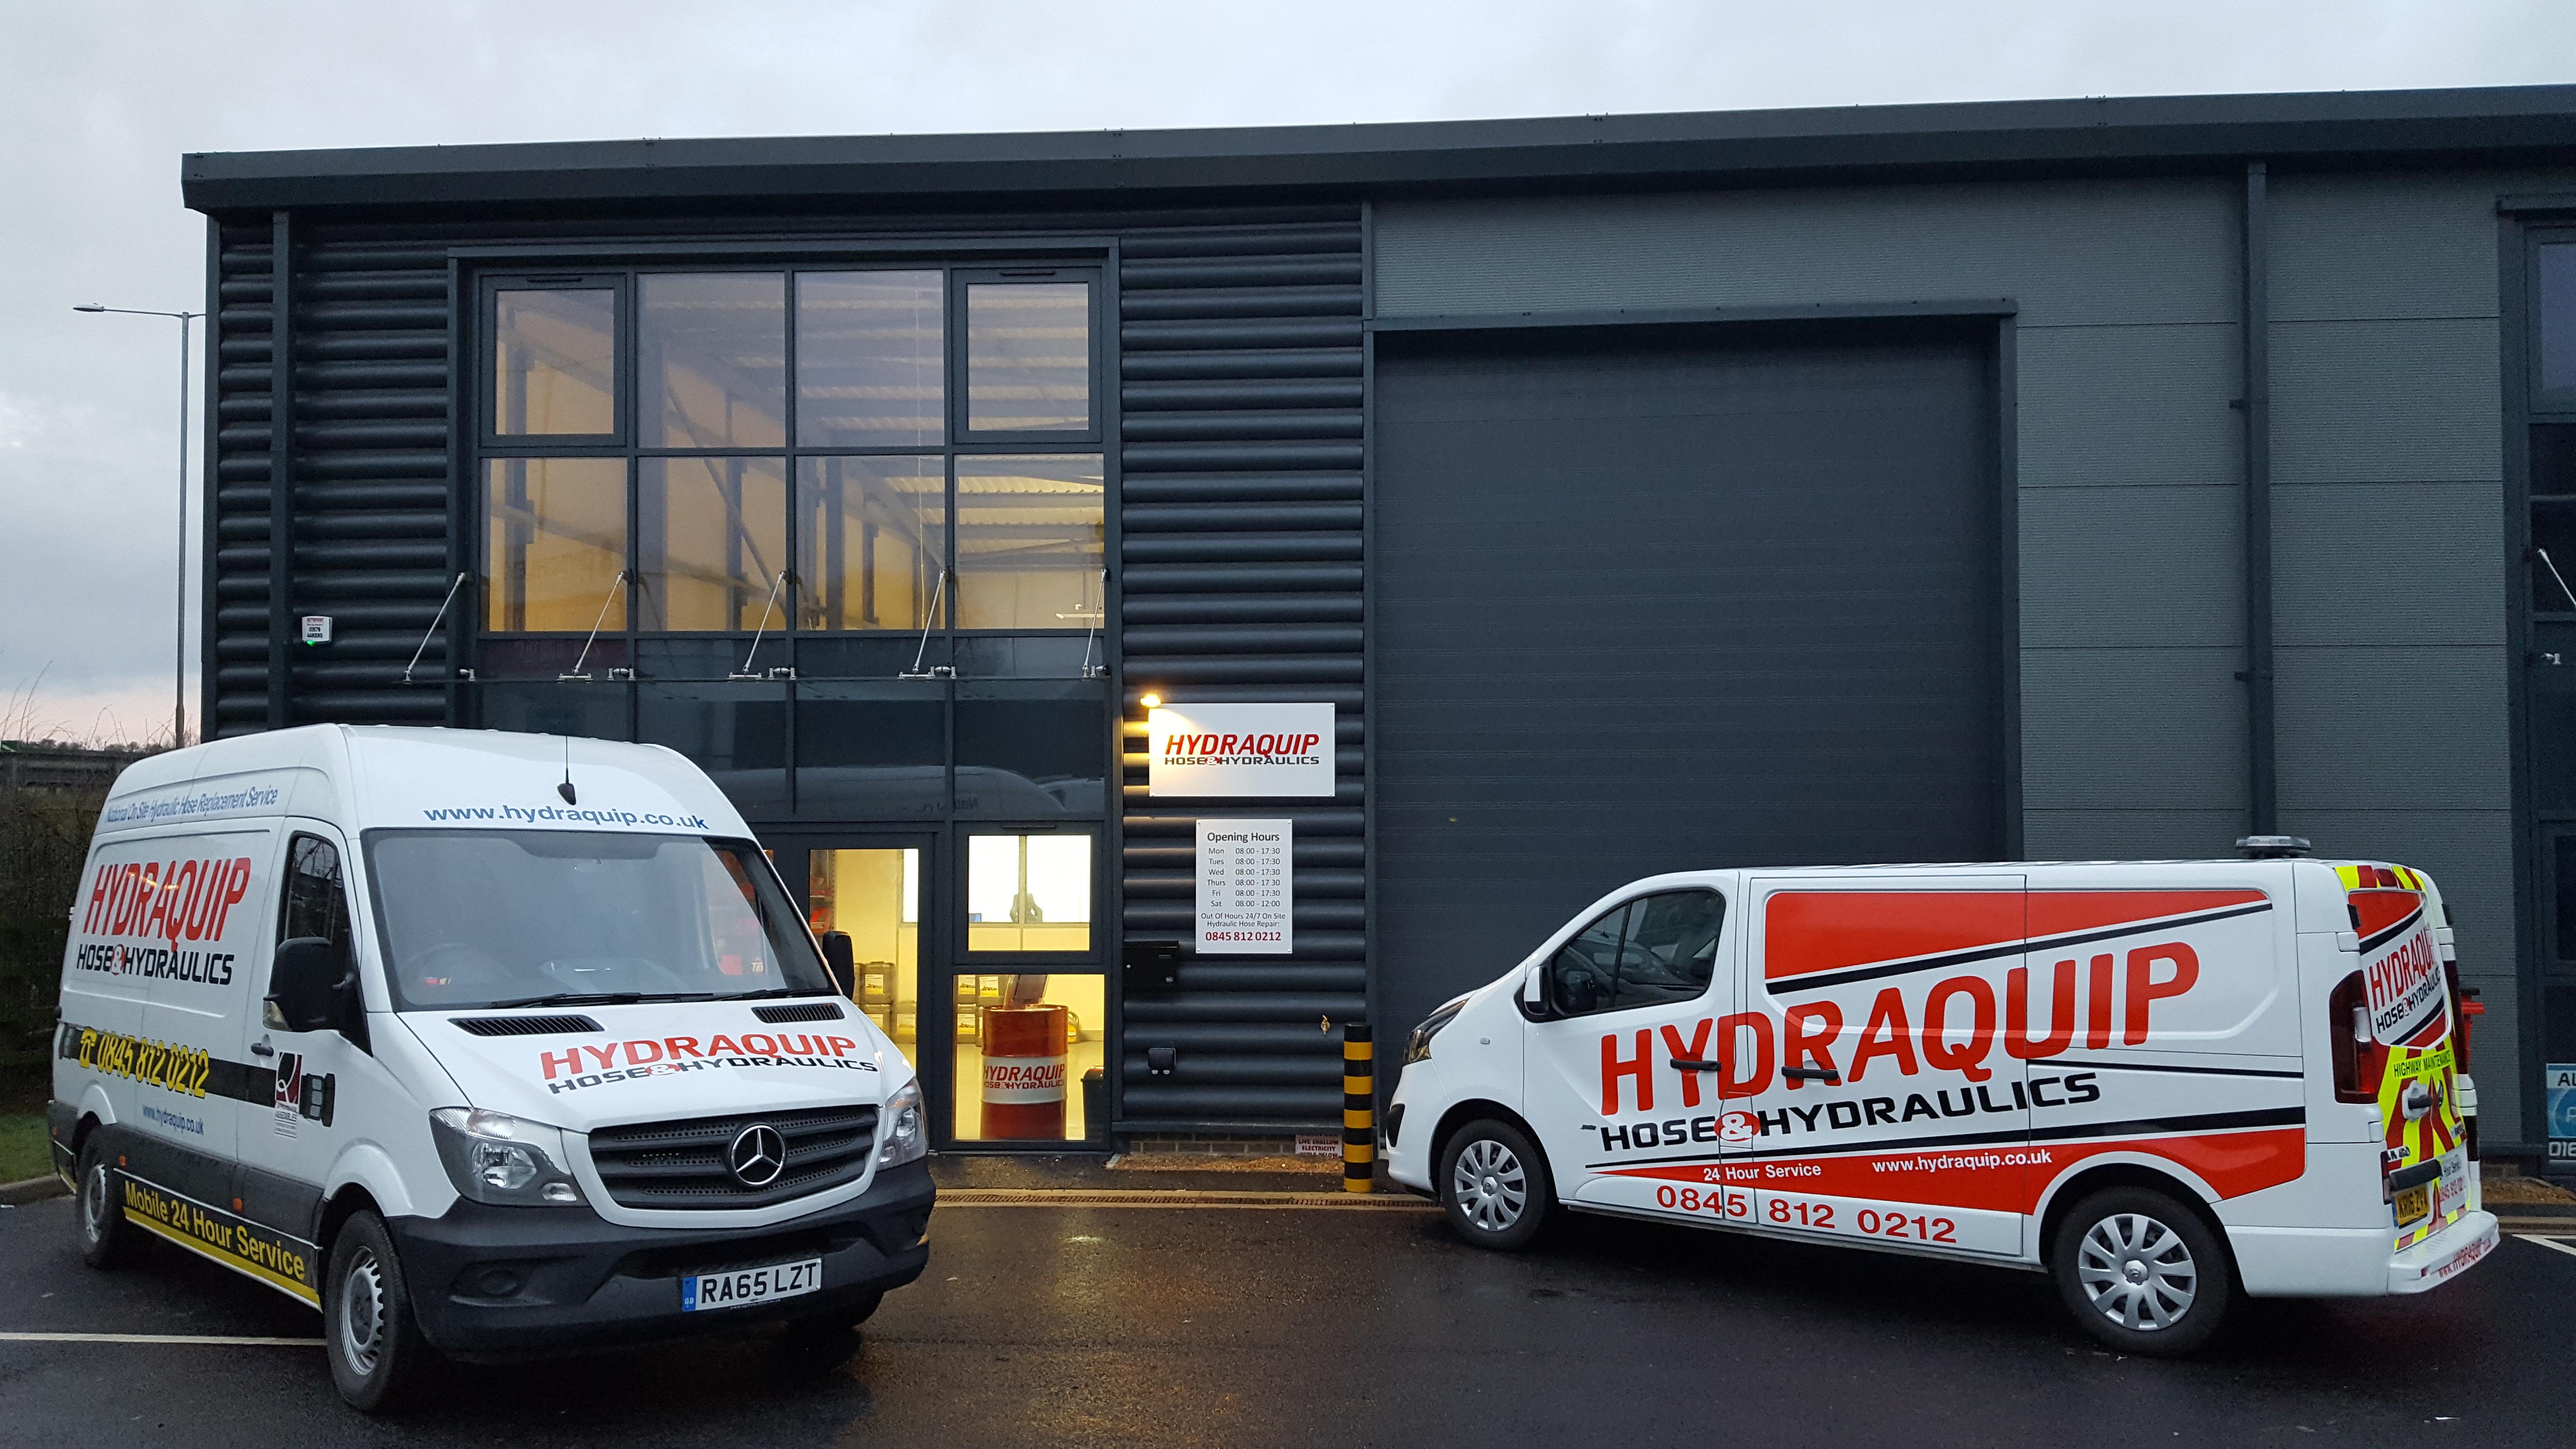 Hydraulic Repairs in Kettering